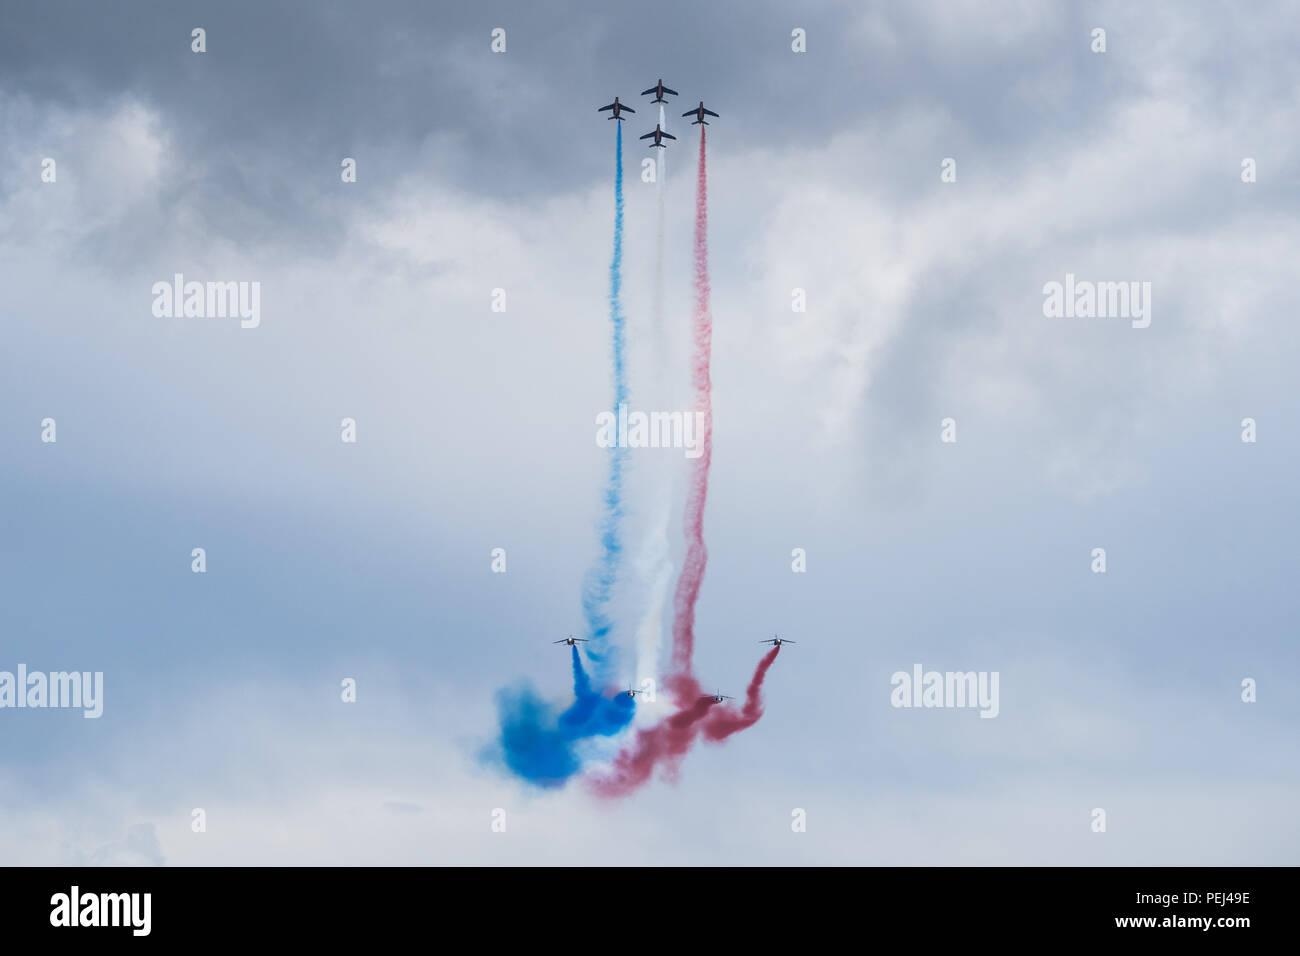 Patrouille de France aerobatic flight display in Le Castellet, France - Stock Image